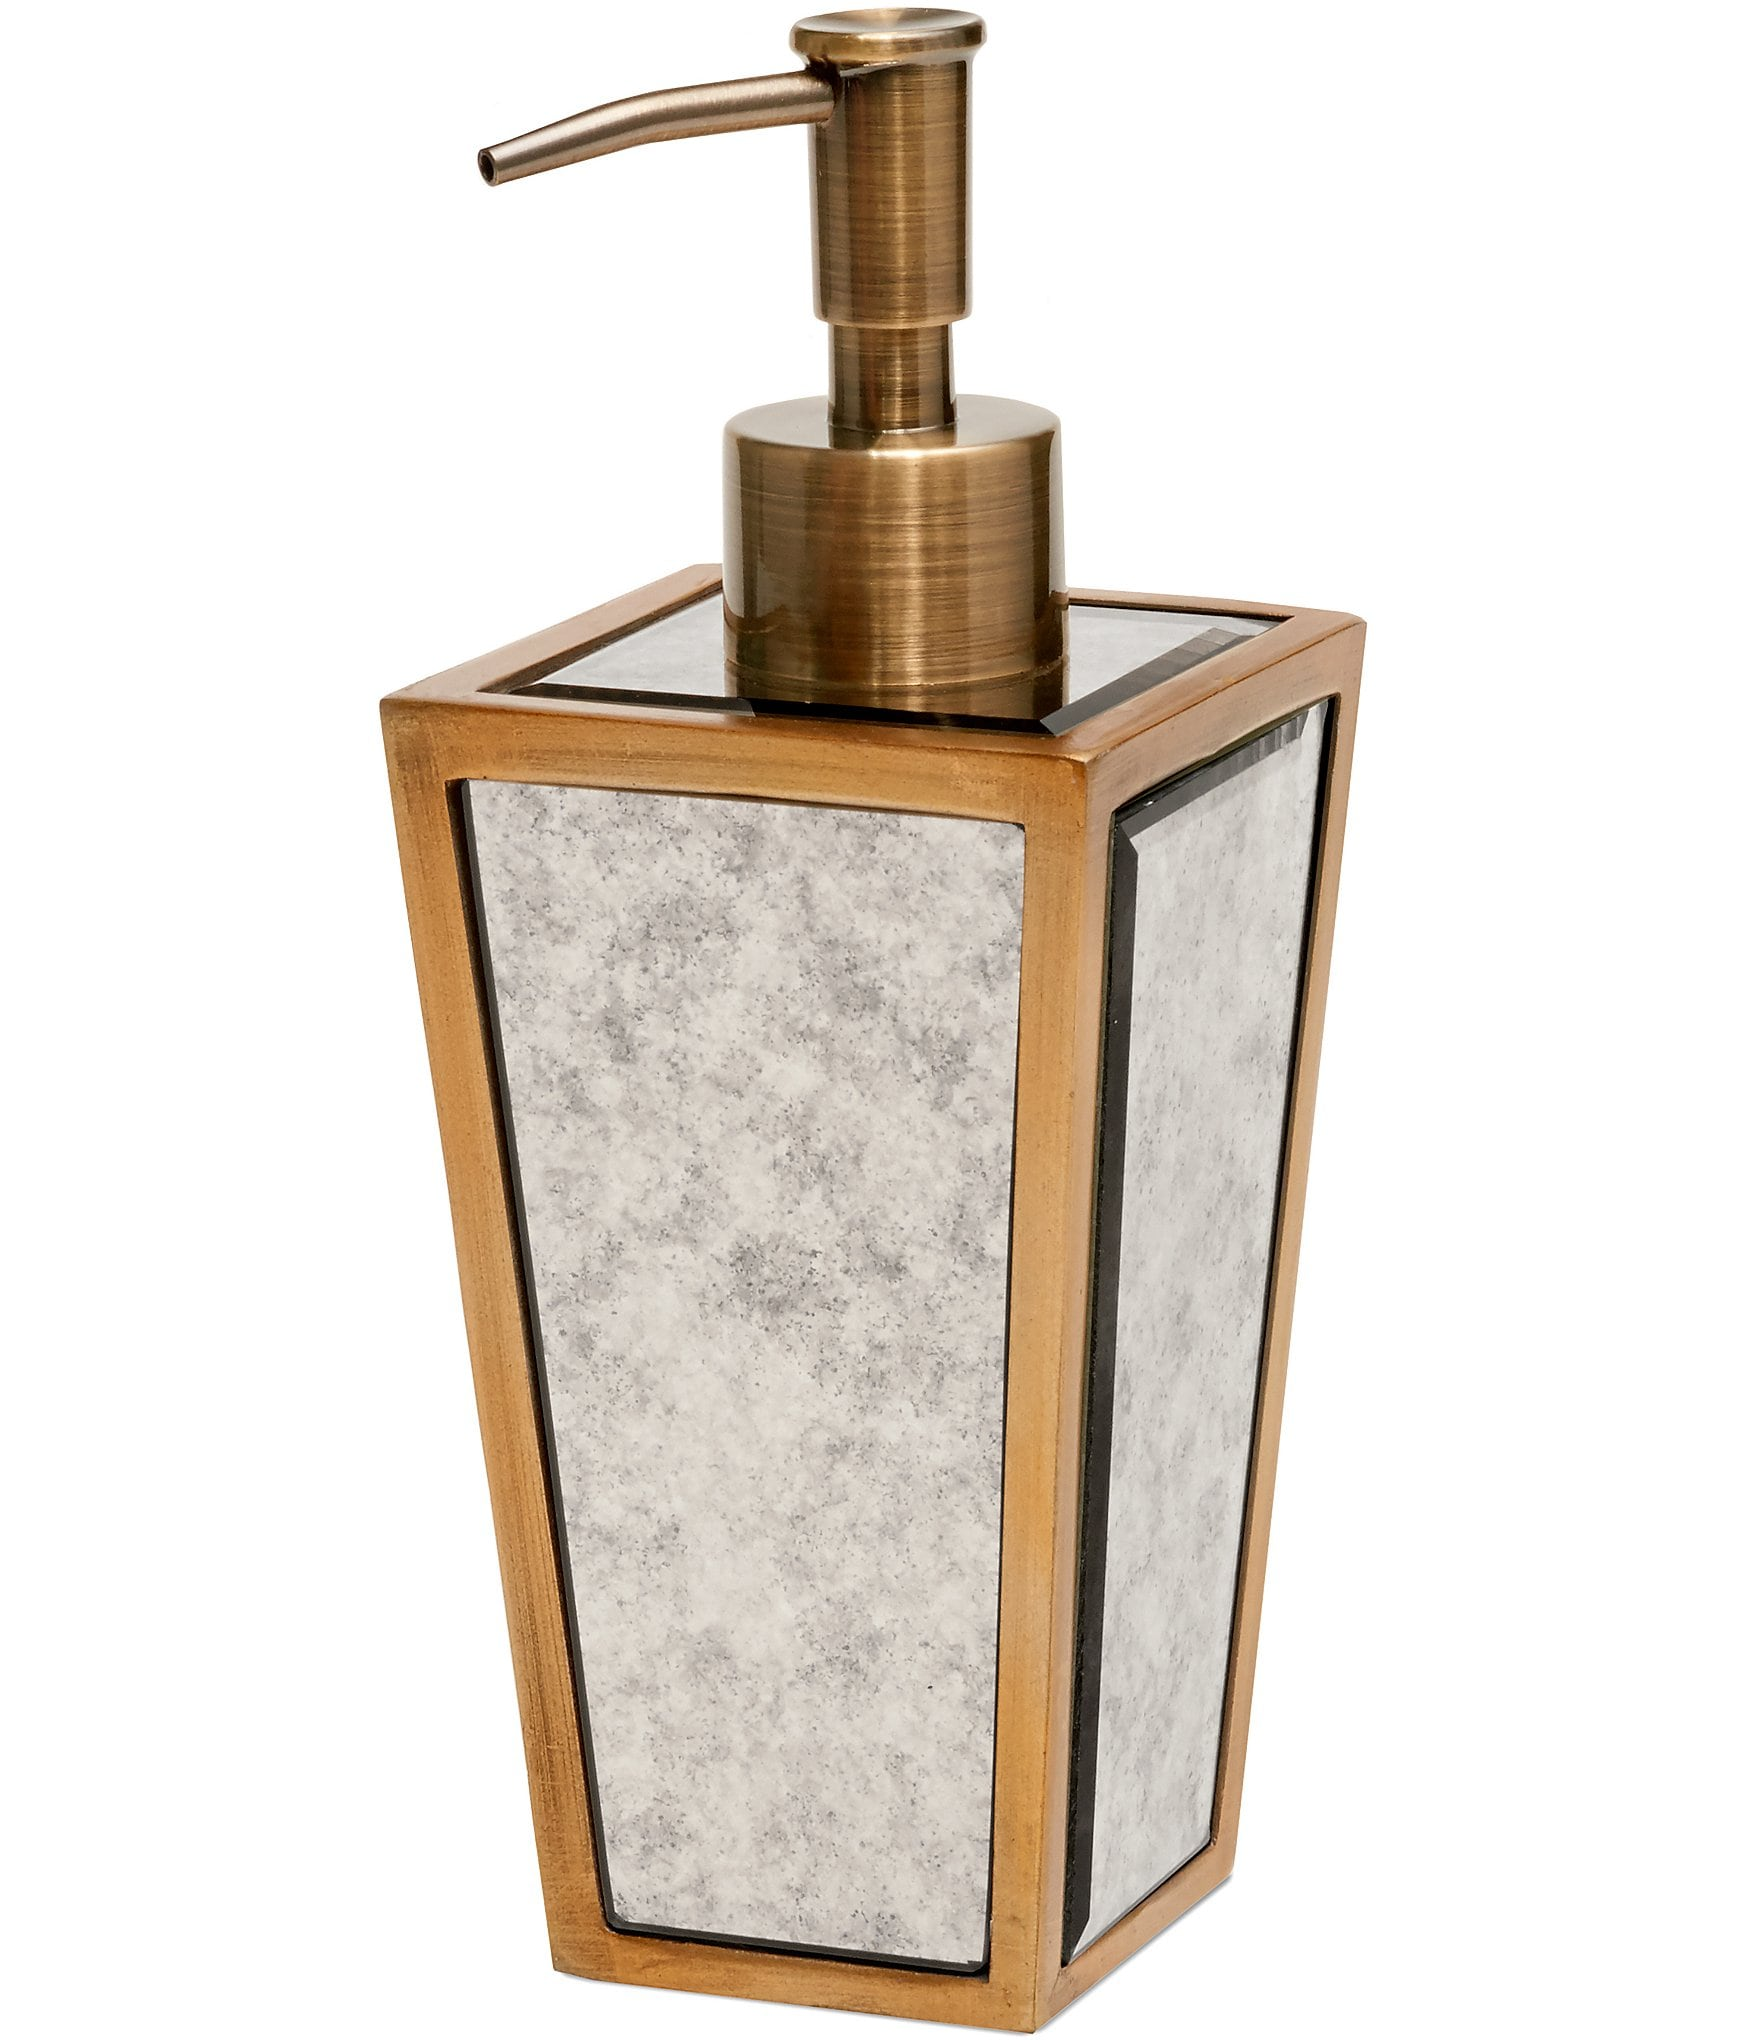 Southern living venetian lotion dispenser dillards for Dillards bathroom accessories